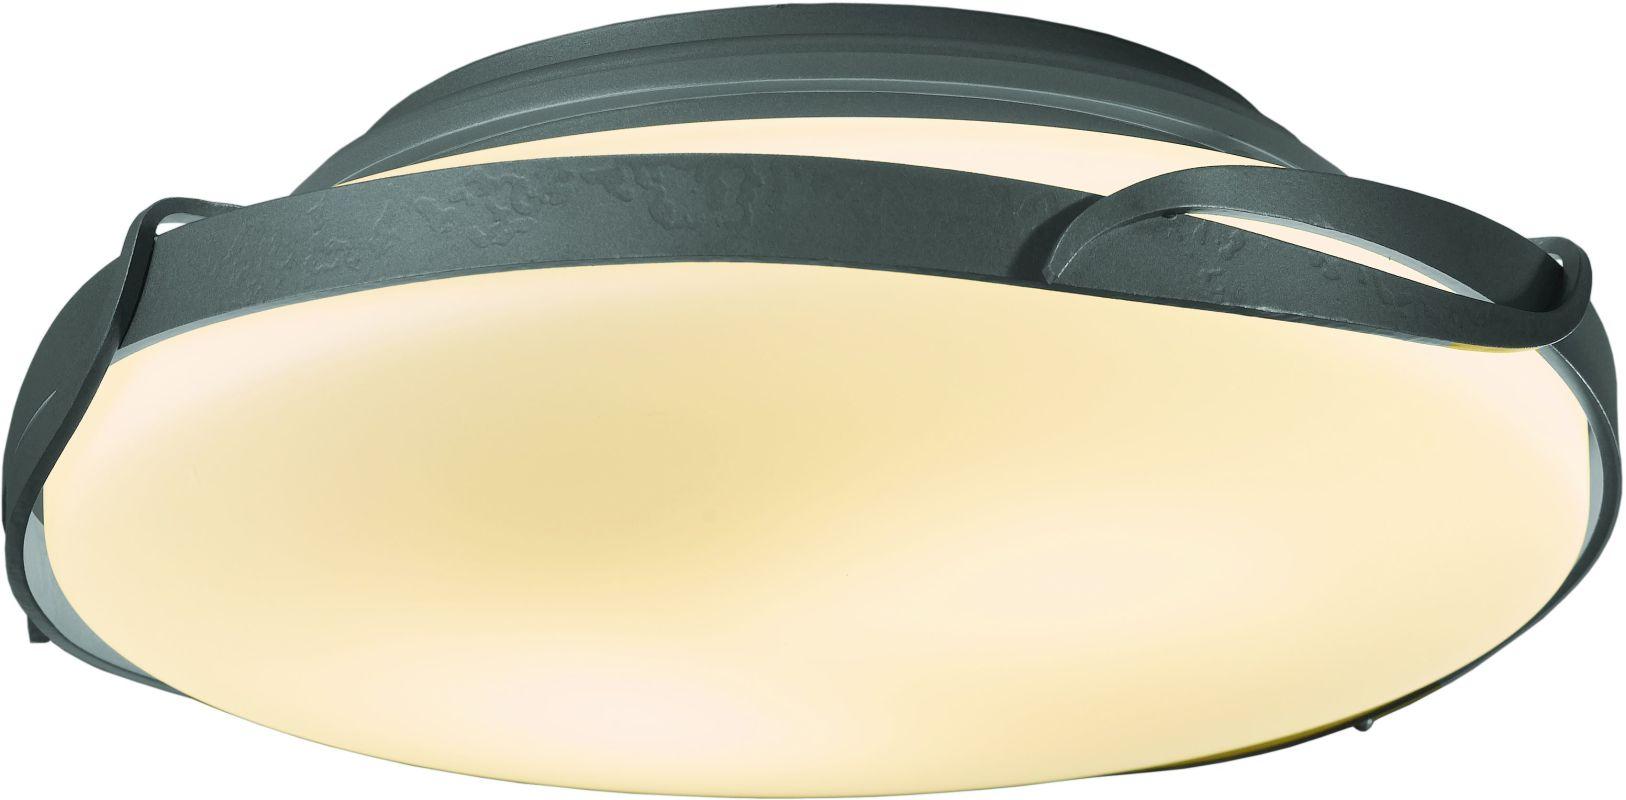 Hubbardton Forge 126740 2 Light Semi-Flush Ceiling Light from the Sale $431.20 ITEM#: 2007252 MODEL# :126740-08 :